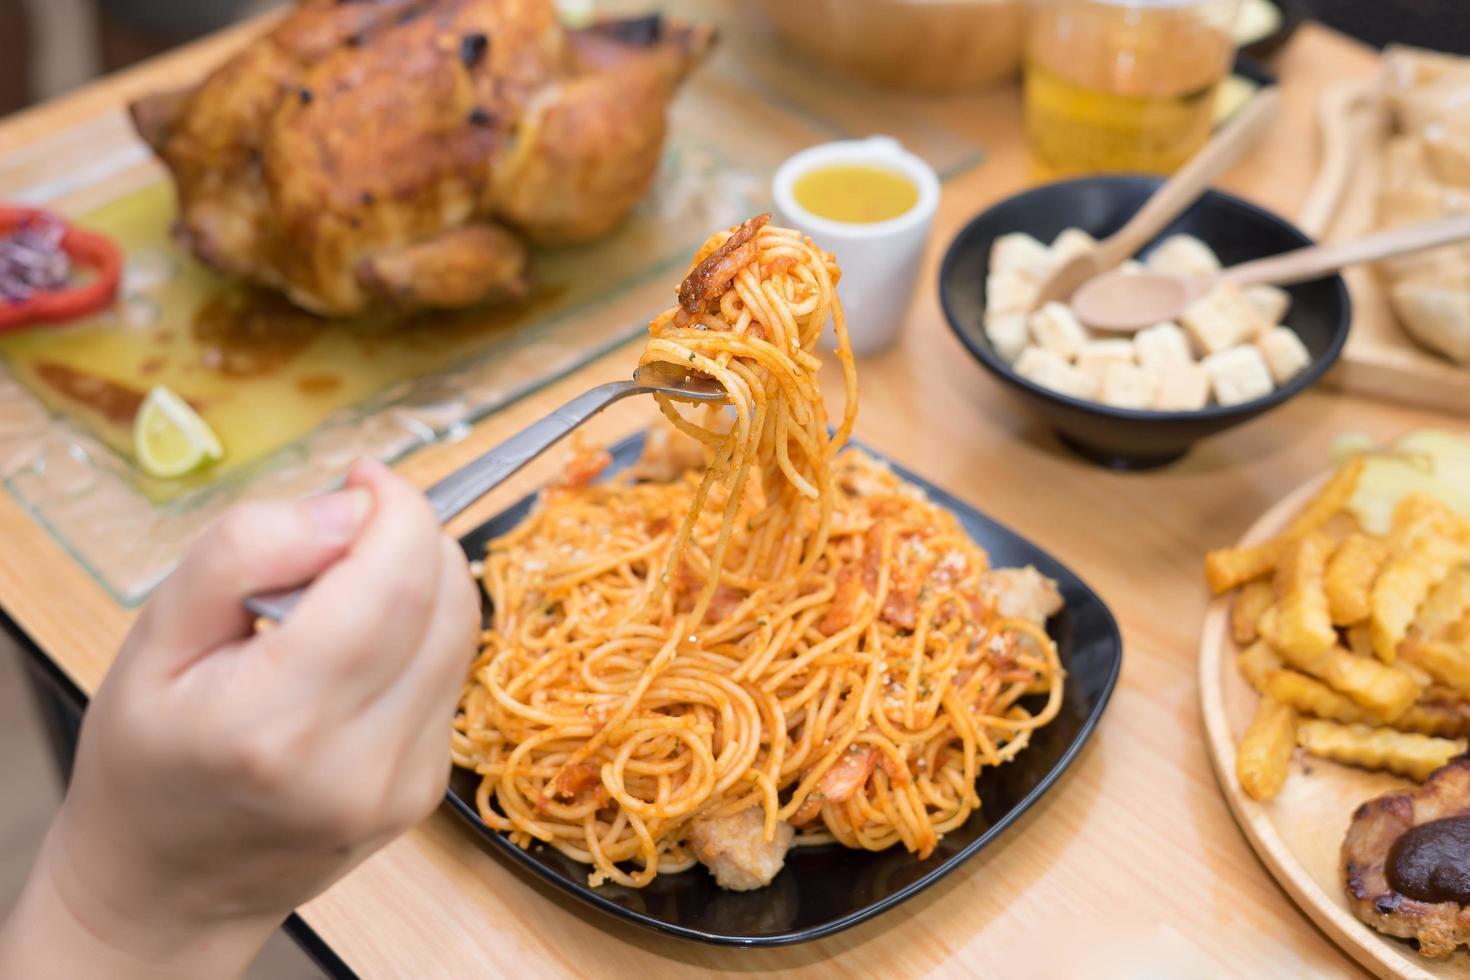 espaguetis servidos en un plato negro foto